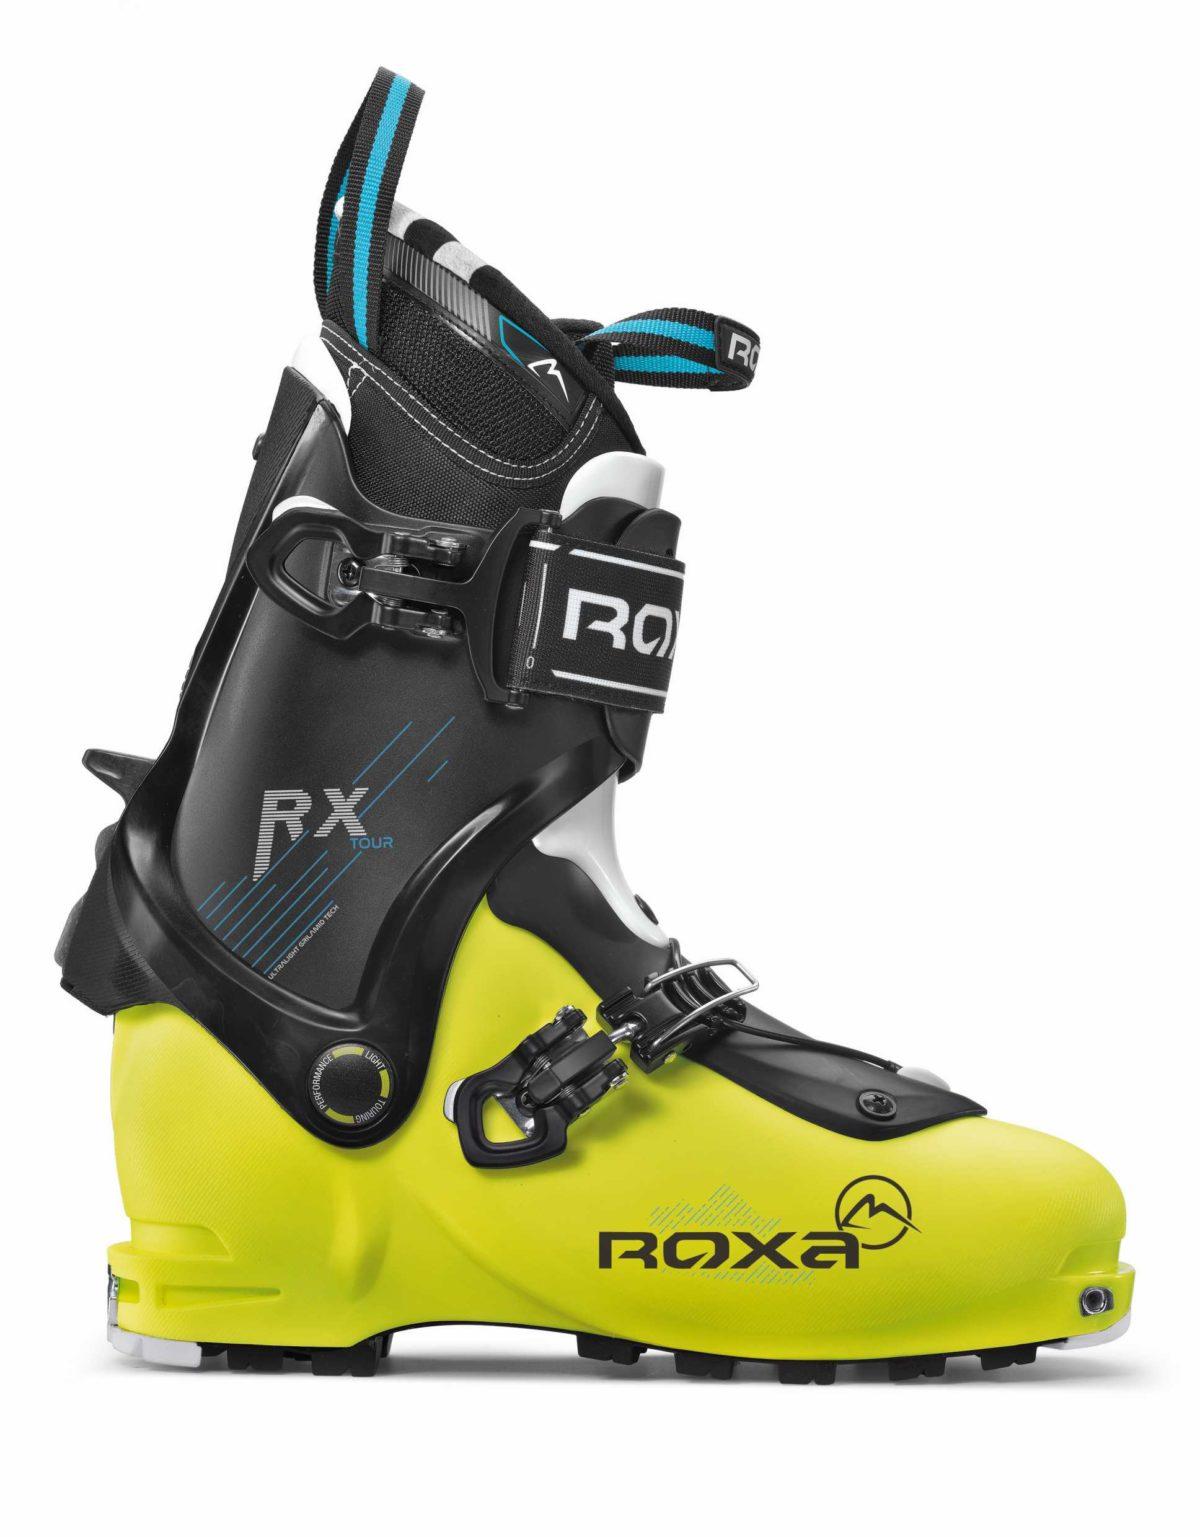 Roxa RX TOUR 1